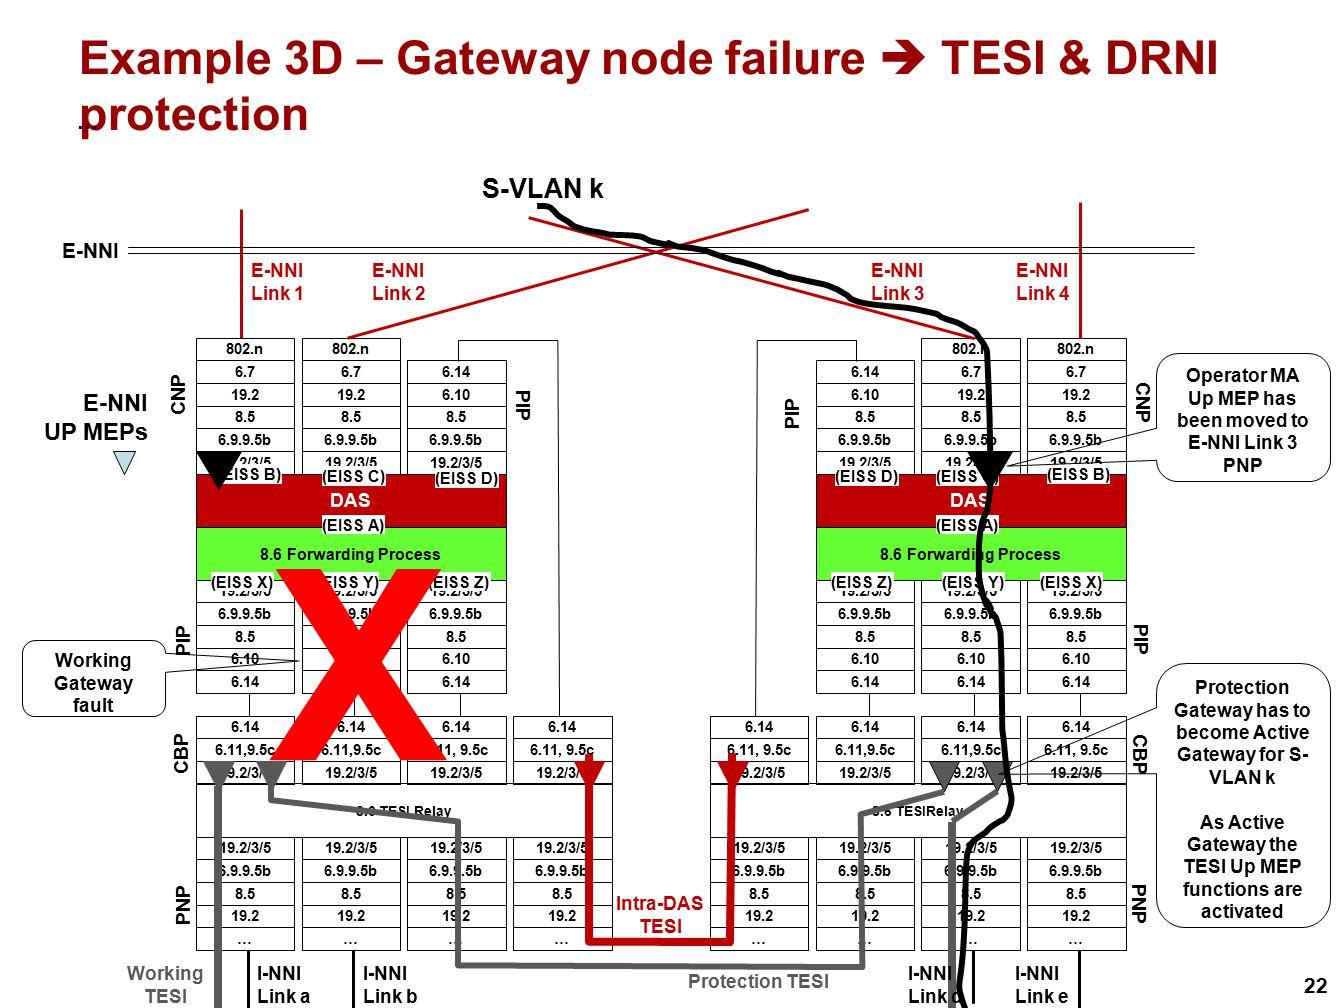 Example 3D – Gateway node failure  TESI & DRNI protection